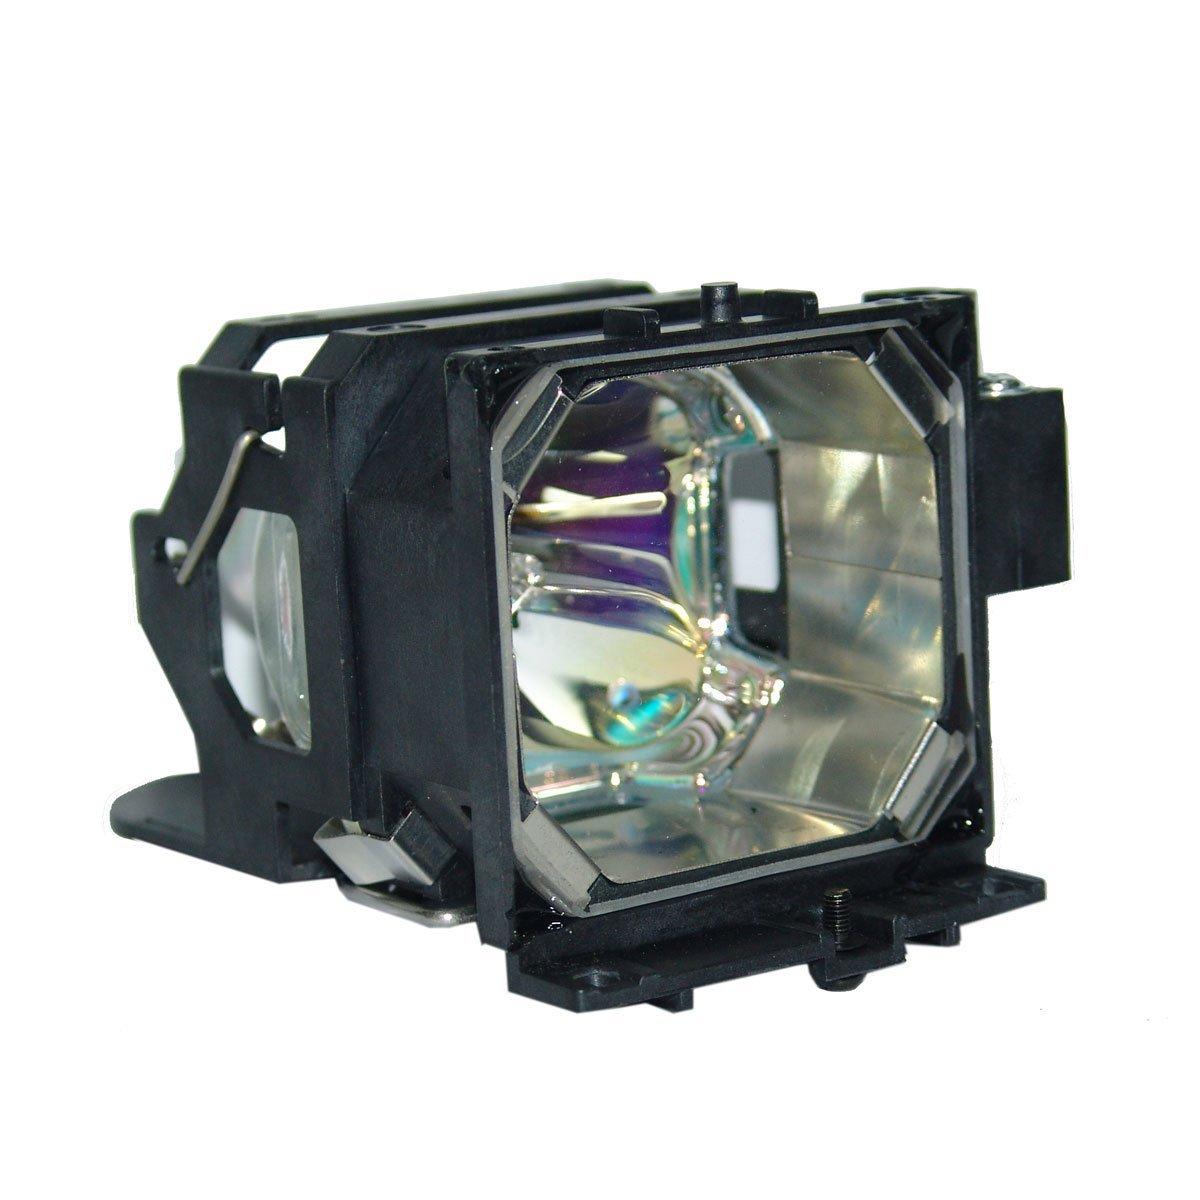 LMP-H150 LMPH150 For Sony VPL-HS2 HS2 VPL-HS3 HS3 Projector Bulb Lamp With Housing